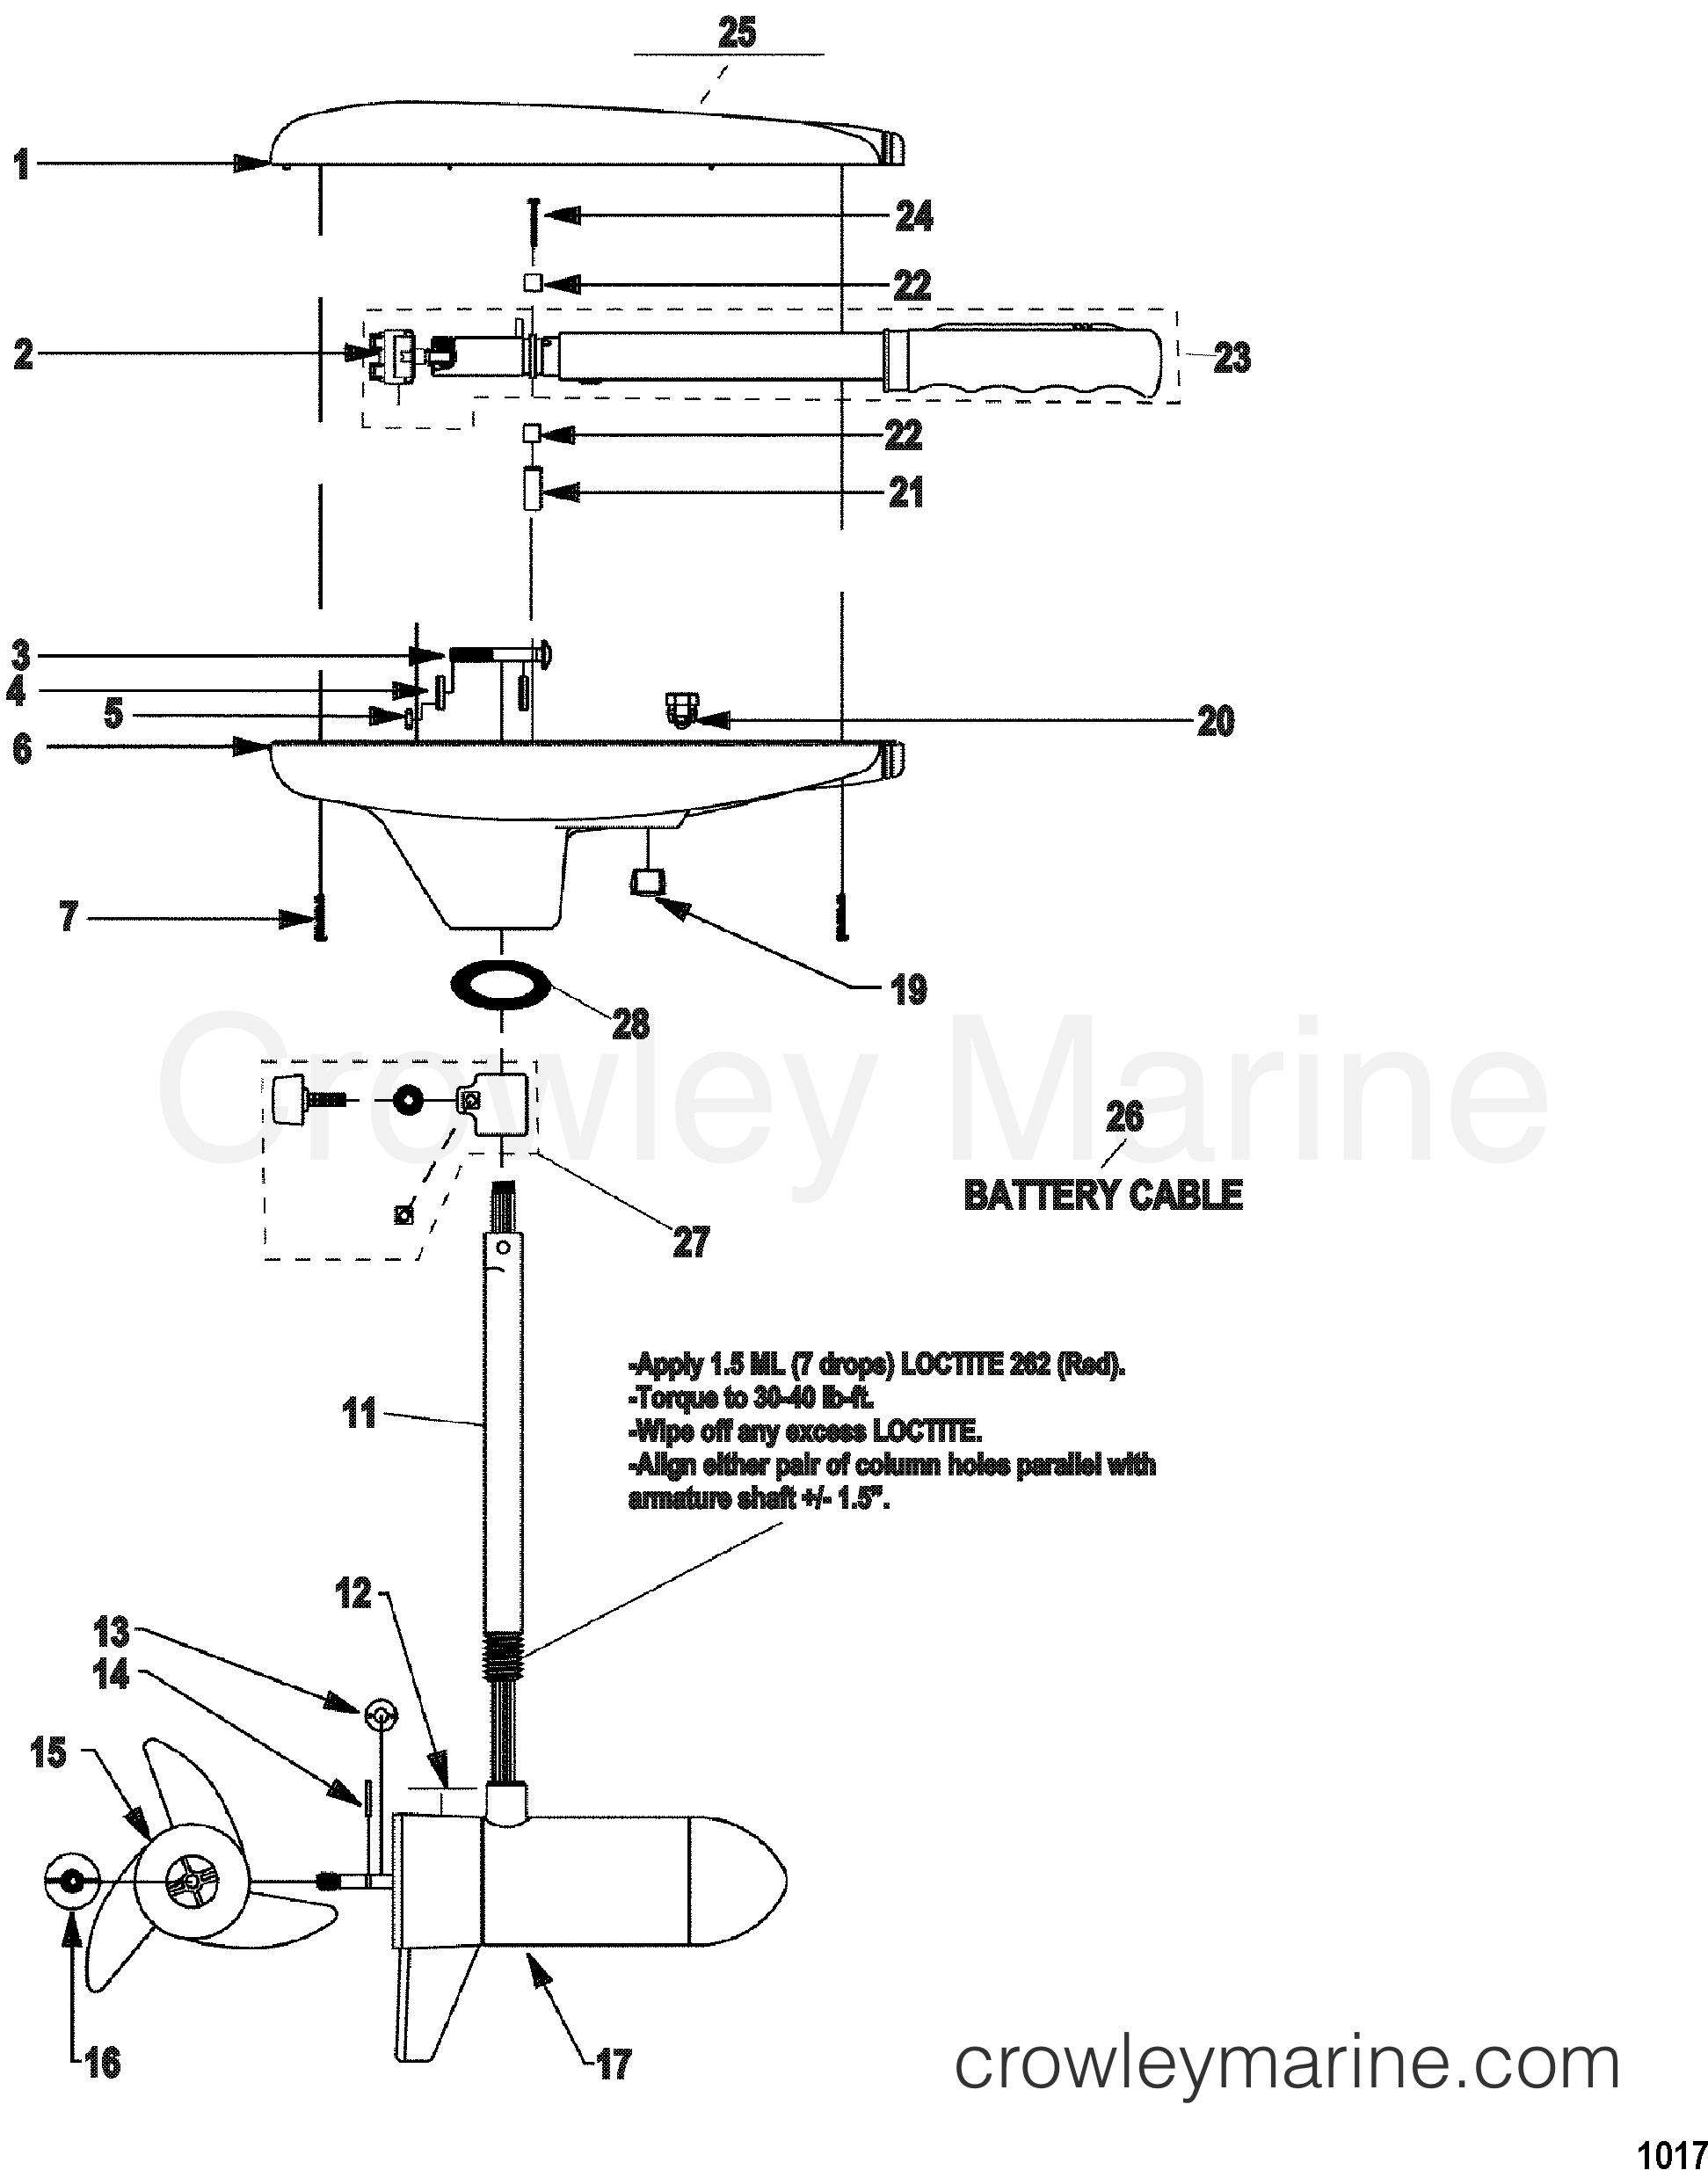 Rcljfplg on 24 Volt Trolling Motor Wiring Diagram